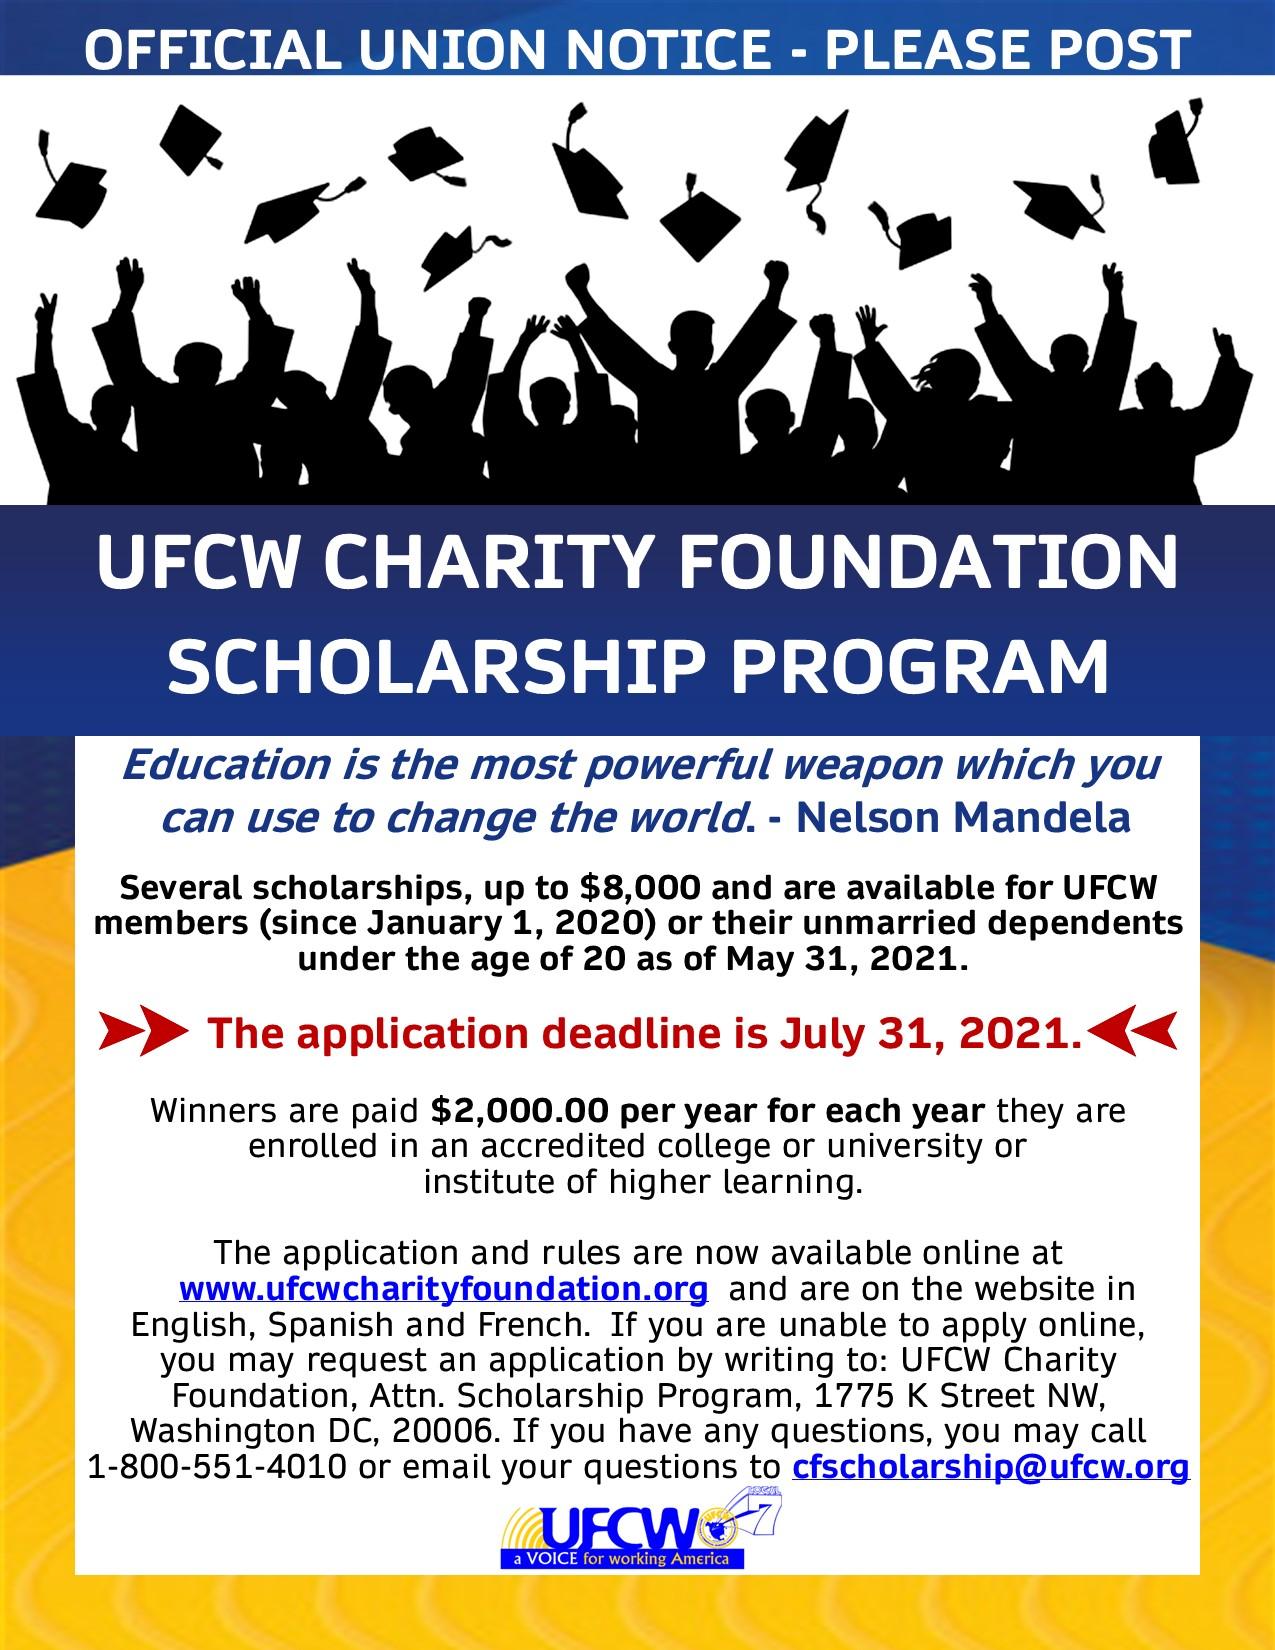 UFCW Charity Foundation Scholarship